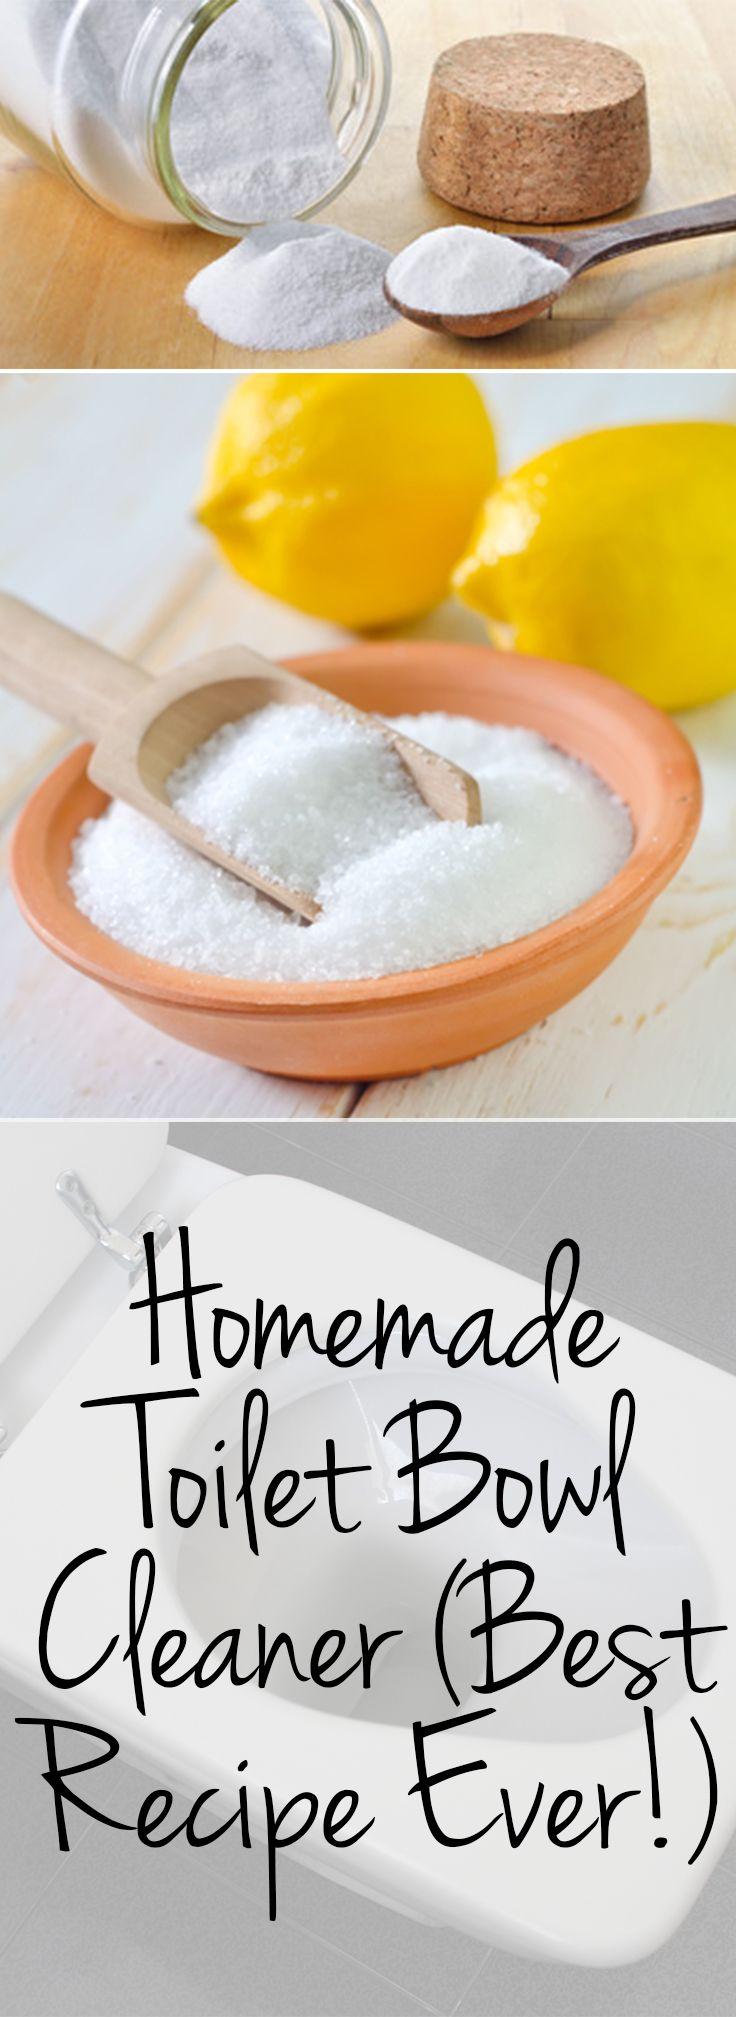 Homemade Toilet Bowl Cleaner Best Recipe Ever Plants